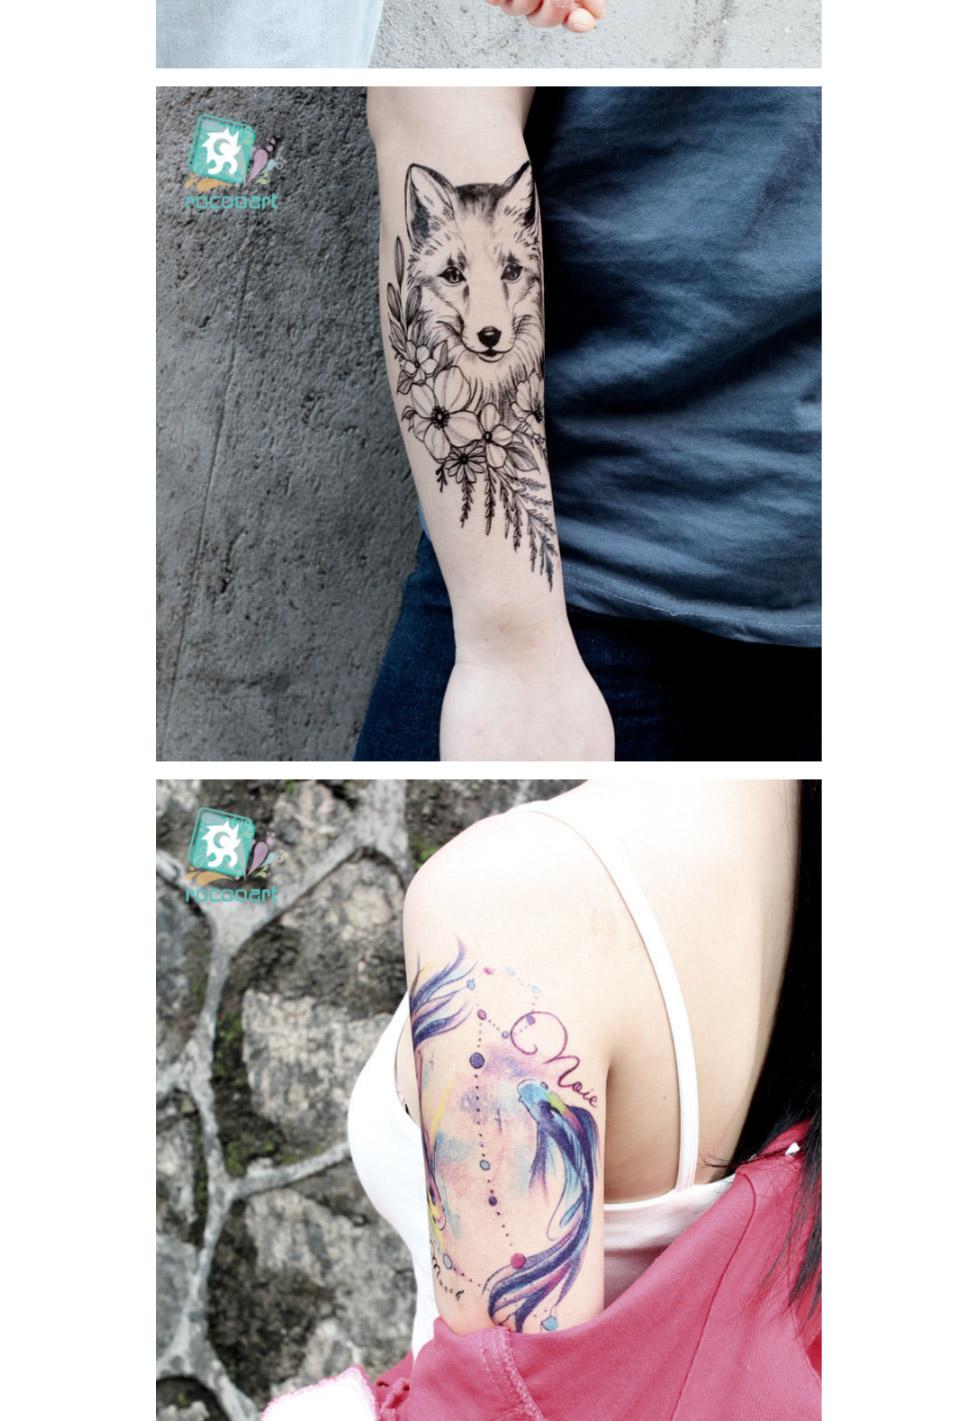 2b0e3ccd8 21 X 15CM Temporary Tattoo Sticker Waterproof Colored Tattoos - Free ...